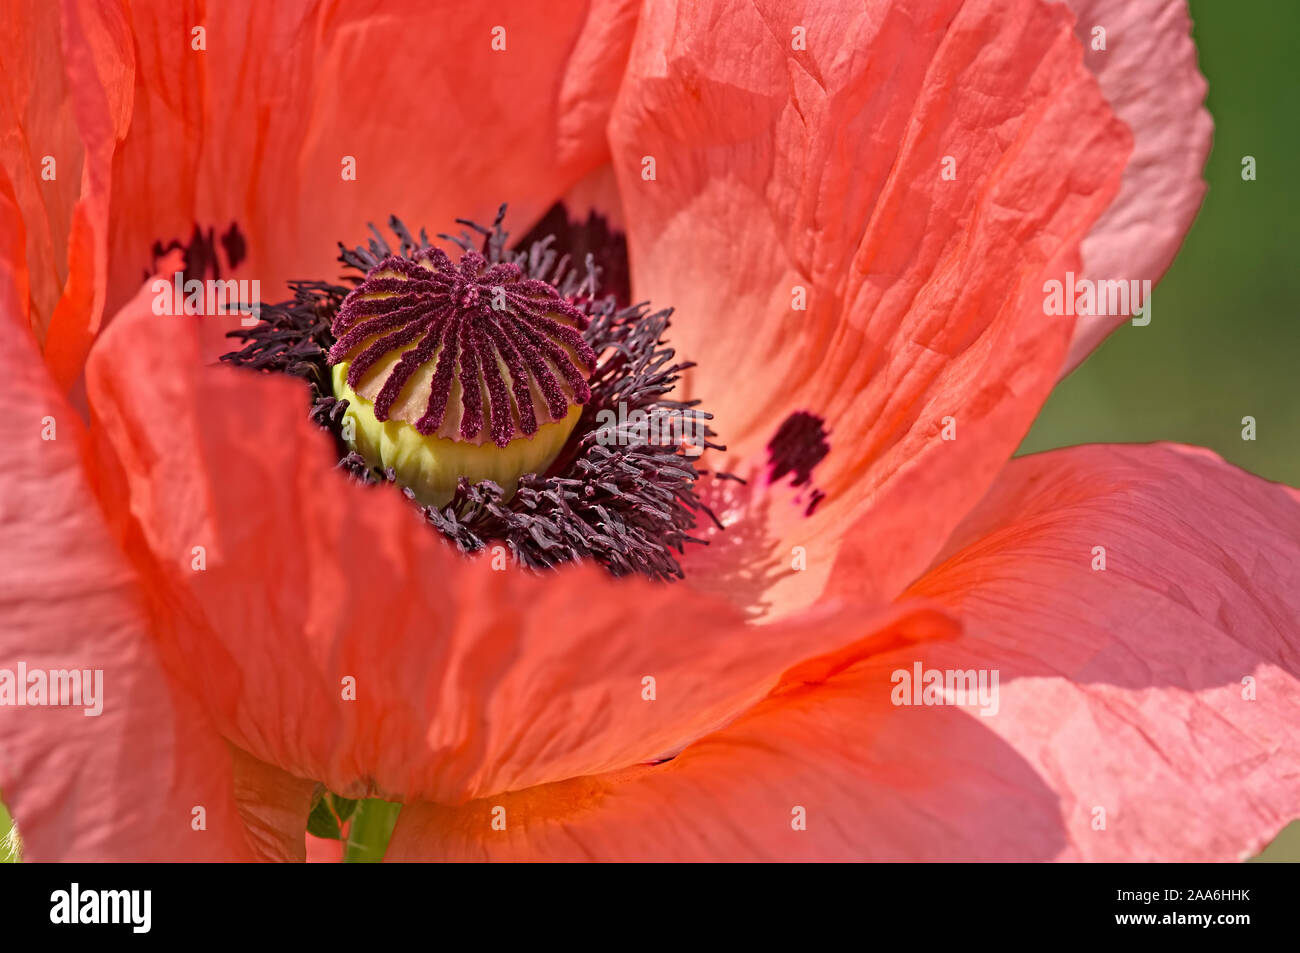 orange-oriental-poppy-centre-papaver-orientale-showing-its-crinkly-petals-2AA6HHK.jpg